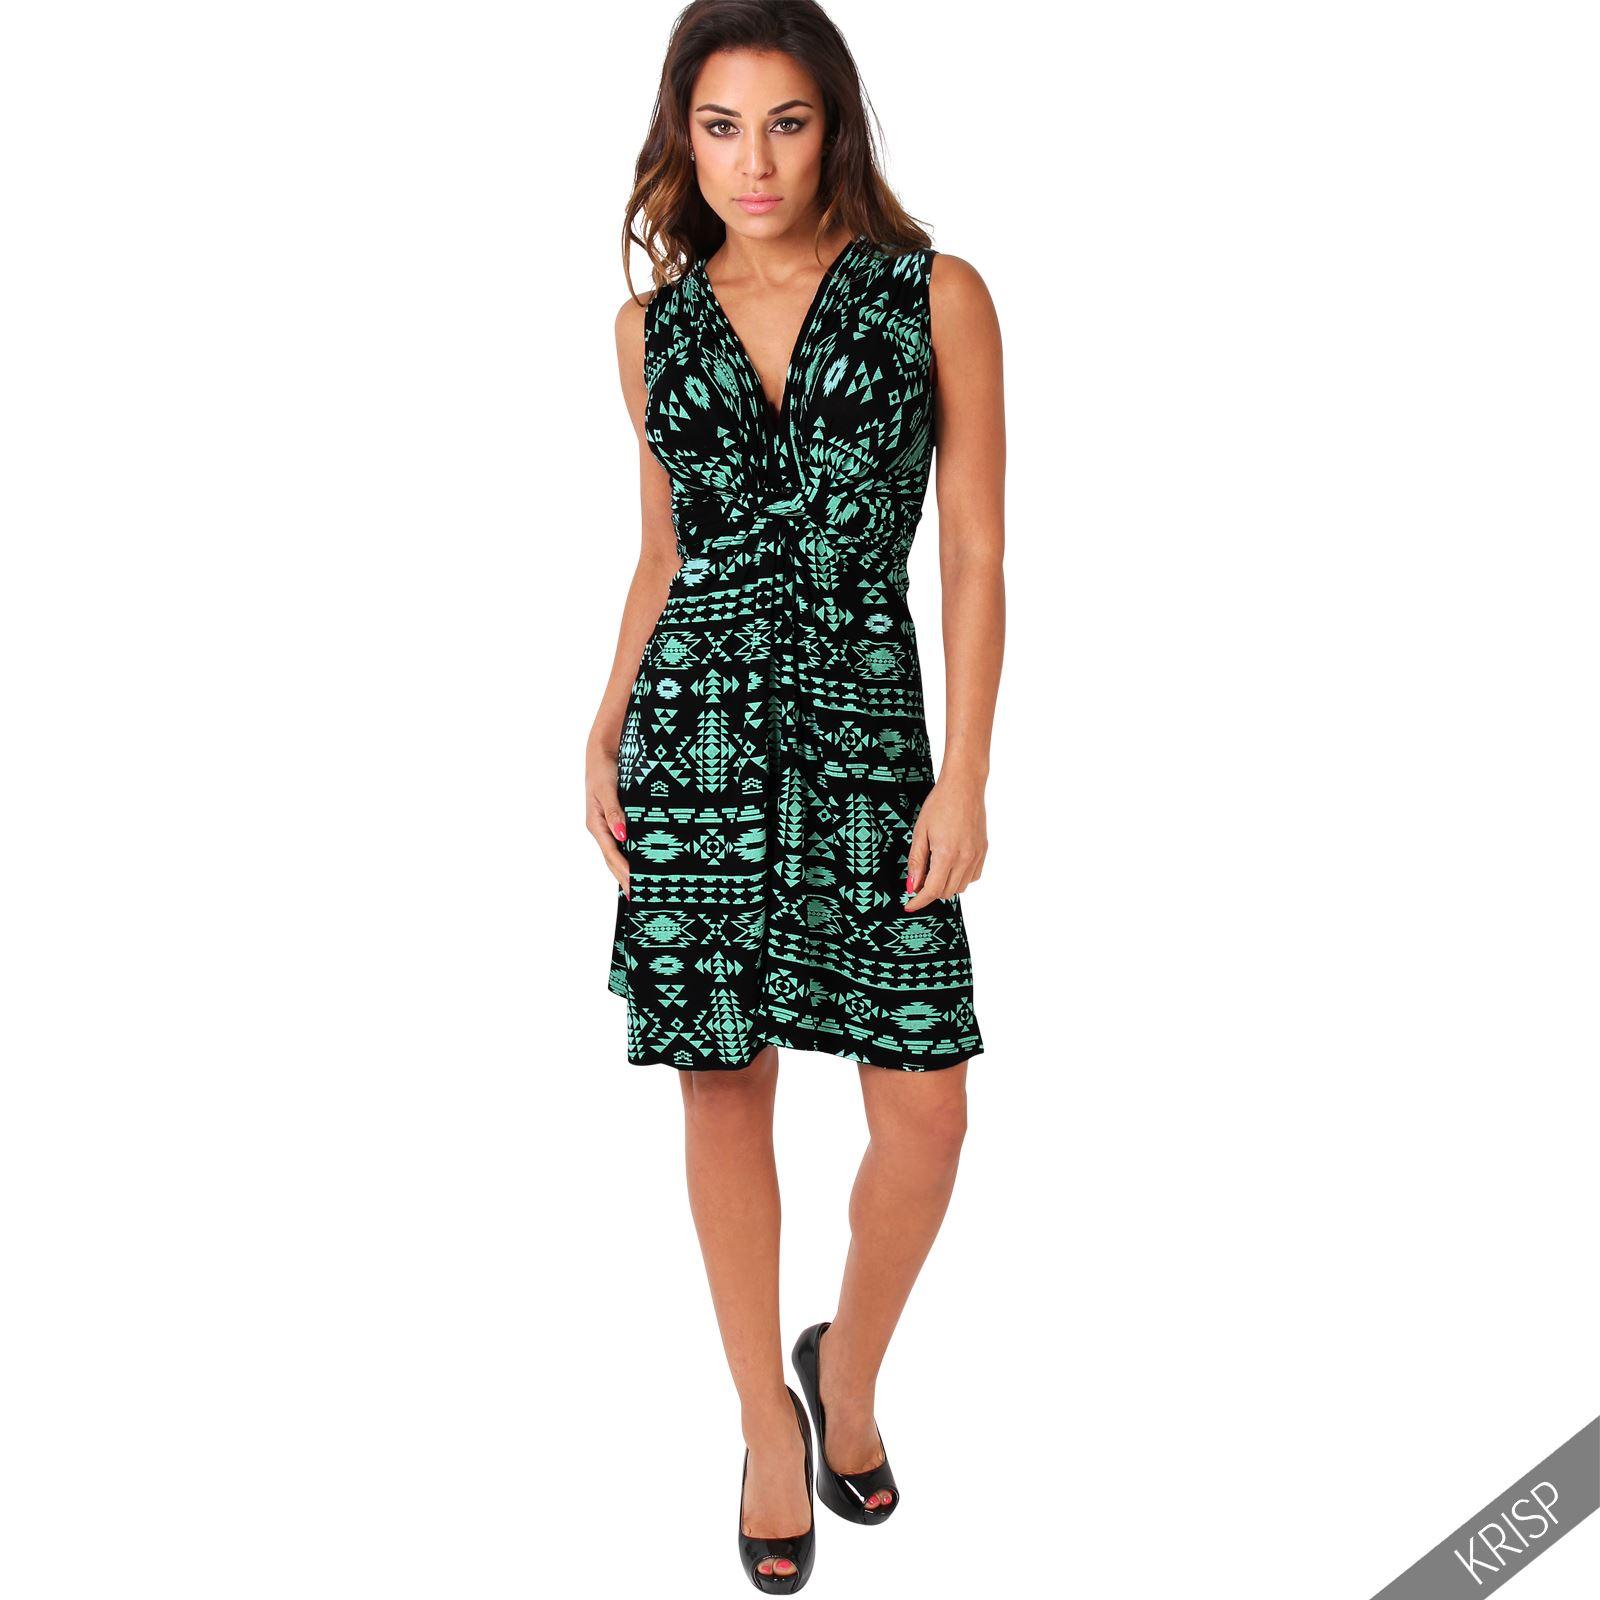 Womens-V-Neck-Mini-Dress-Small-Sizes-Short-Skirt-Tribal-Print-Front-Knot-Party thumbnail 18